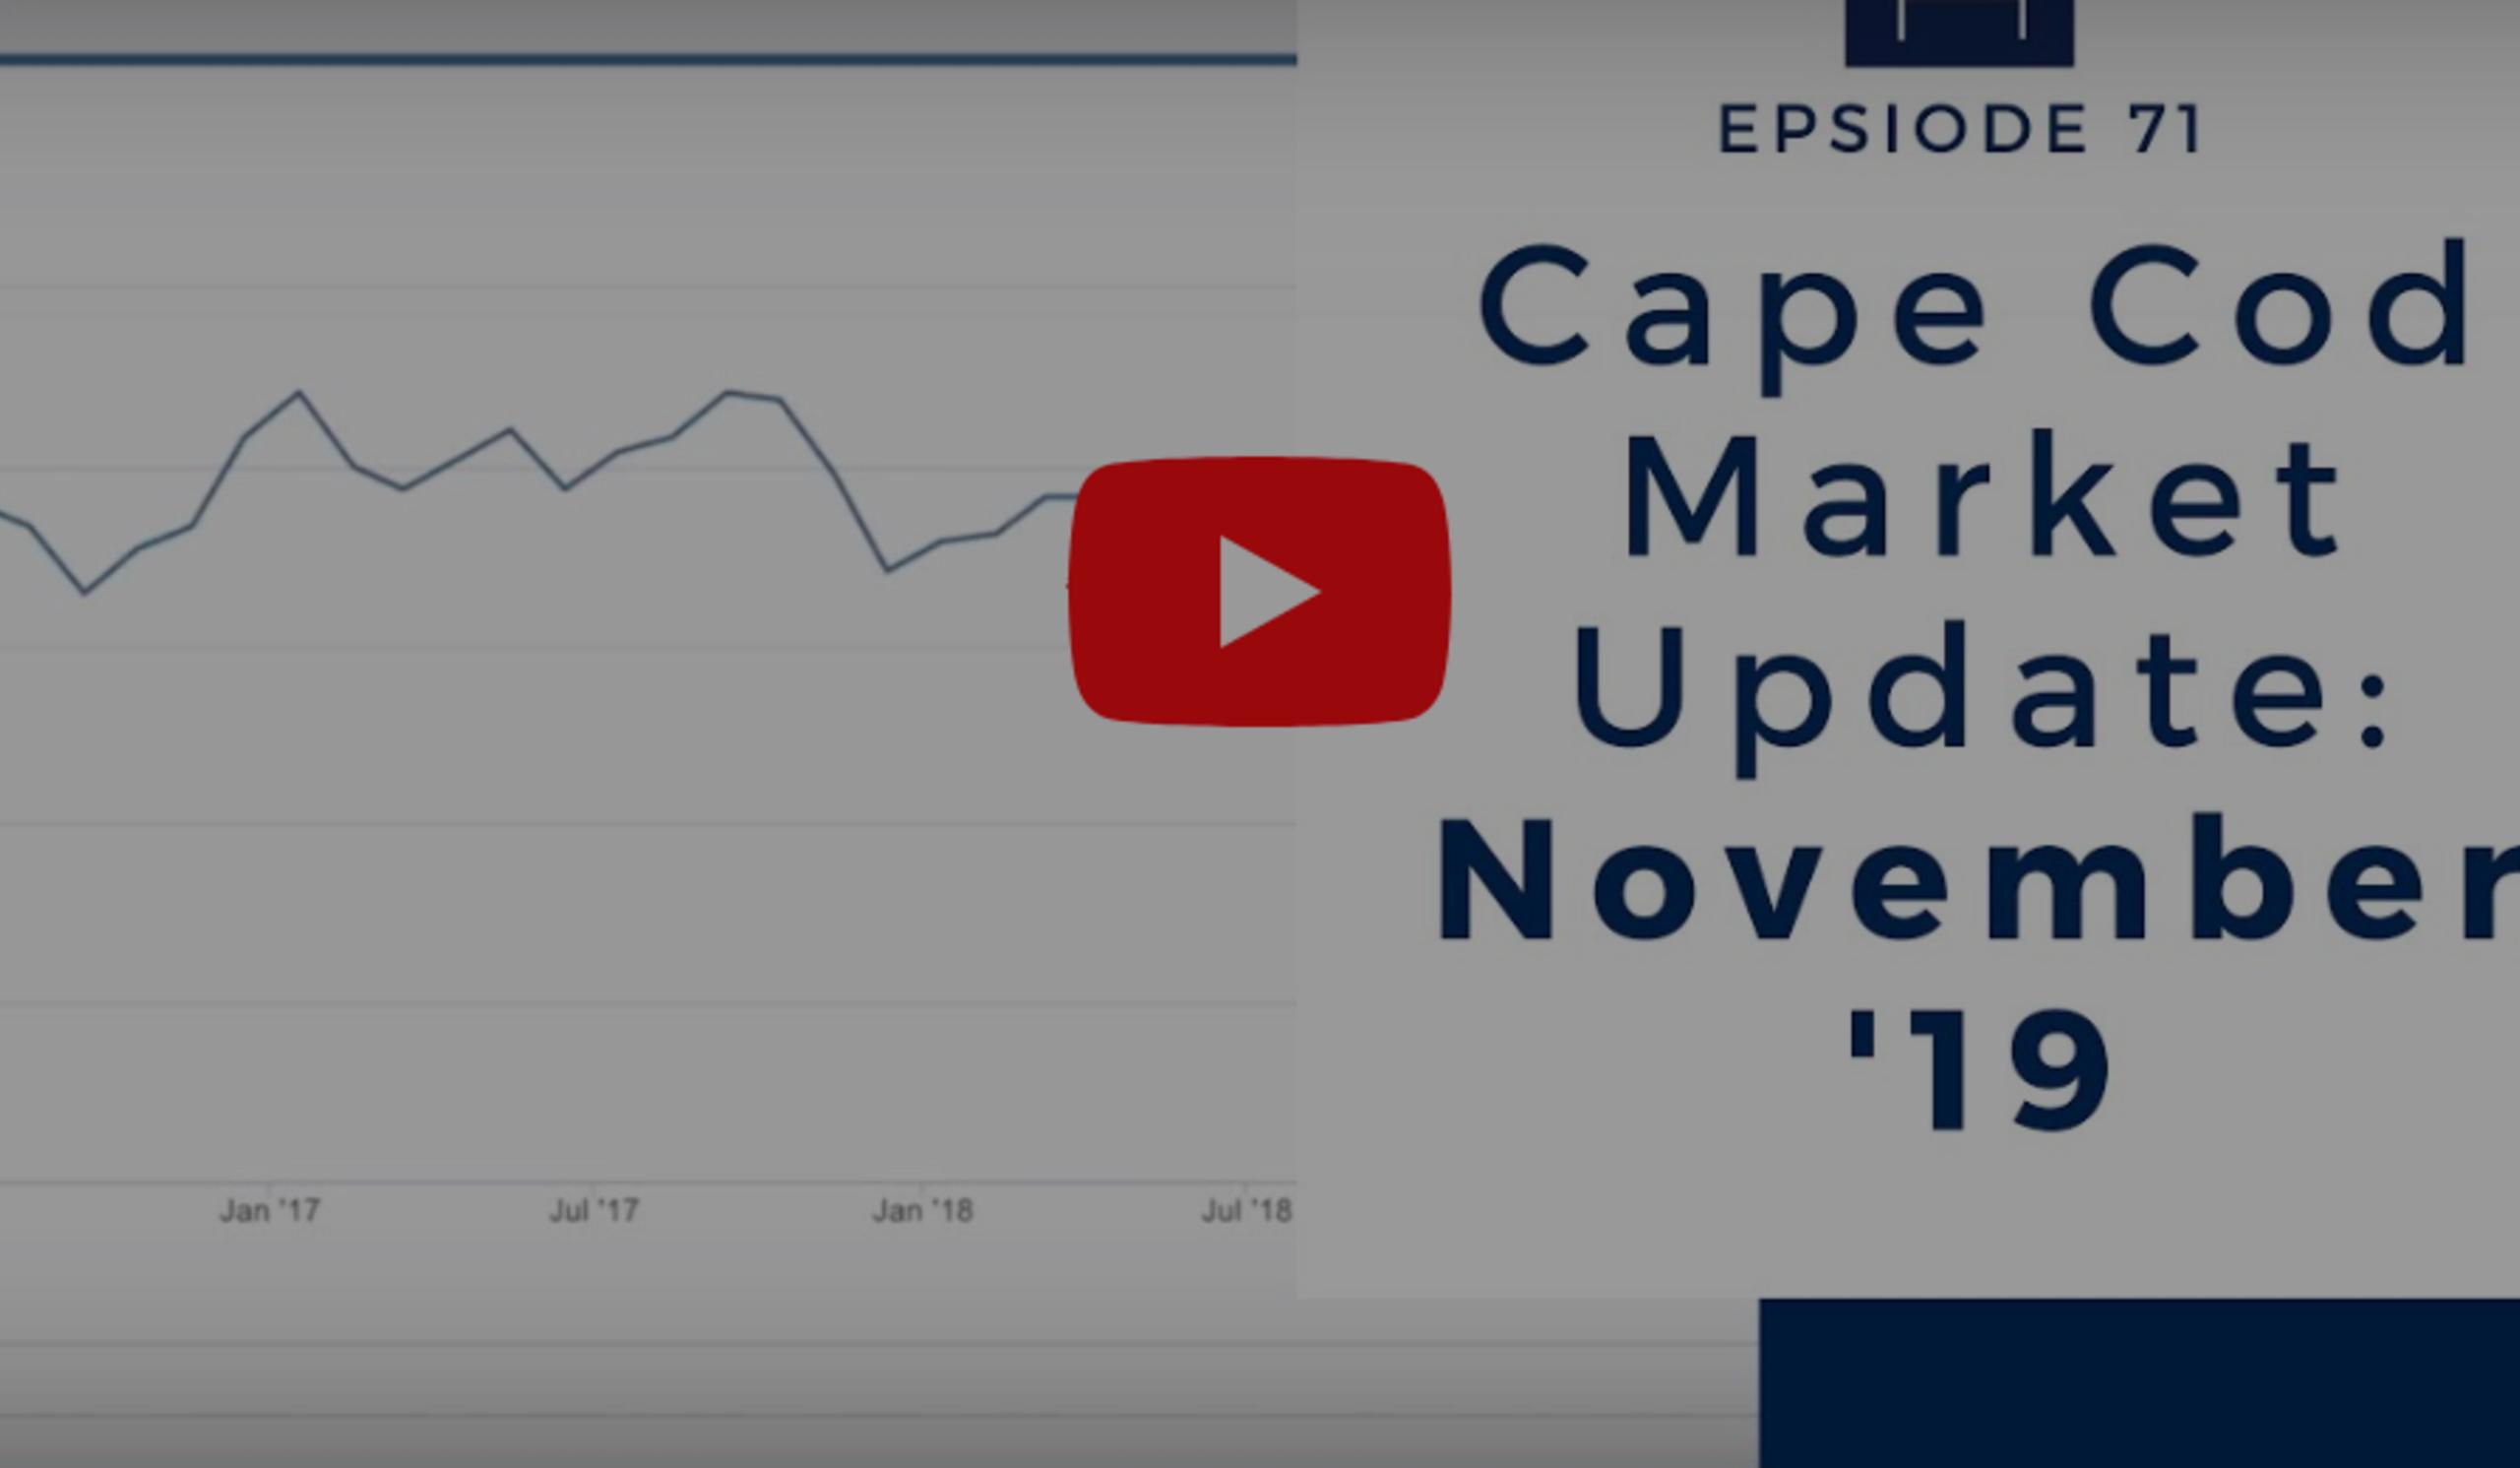 Episode 70: Cape Cod Market Update: November '19